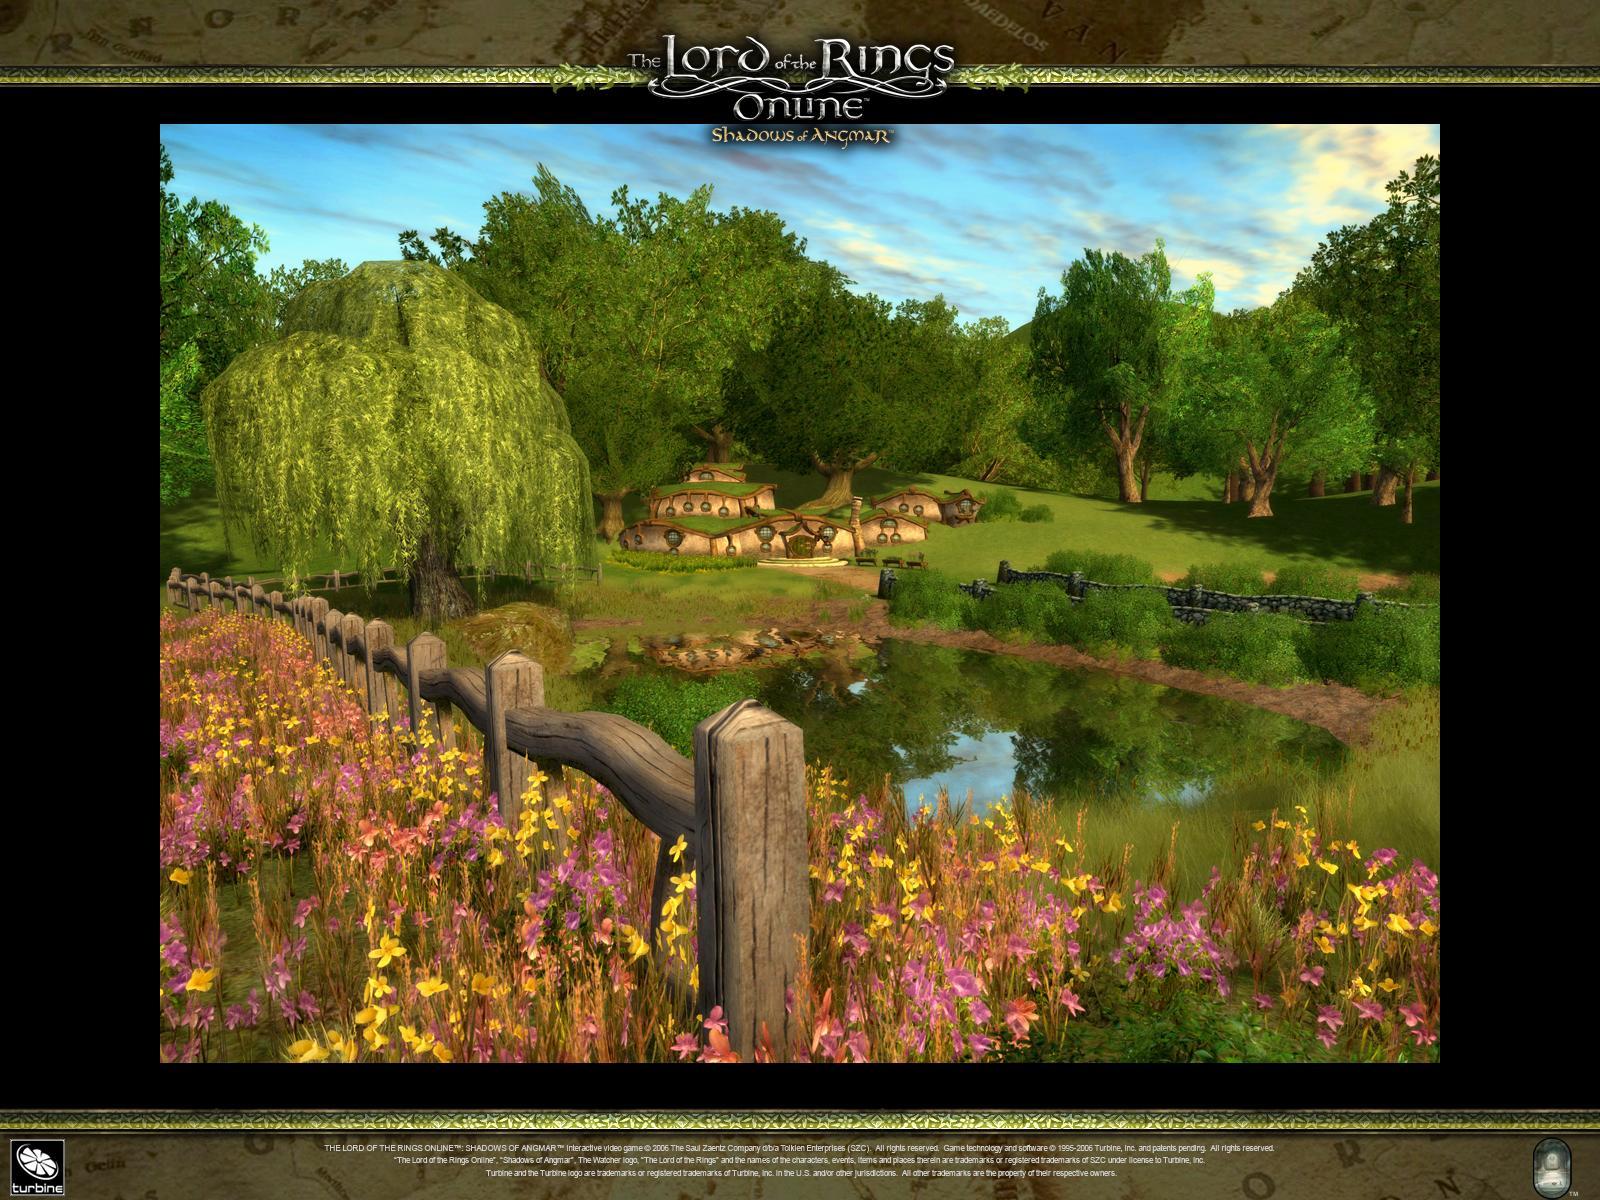 Программы. The Lord of the Rings Online. Игра.